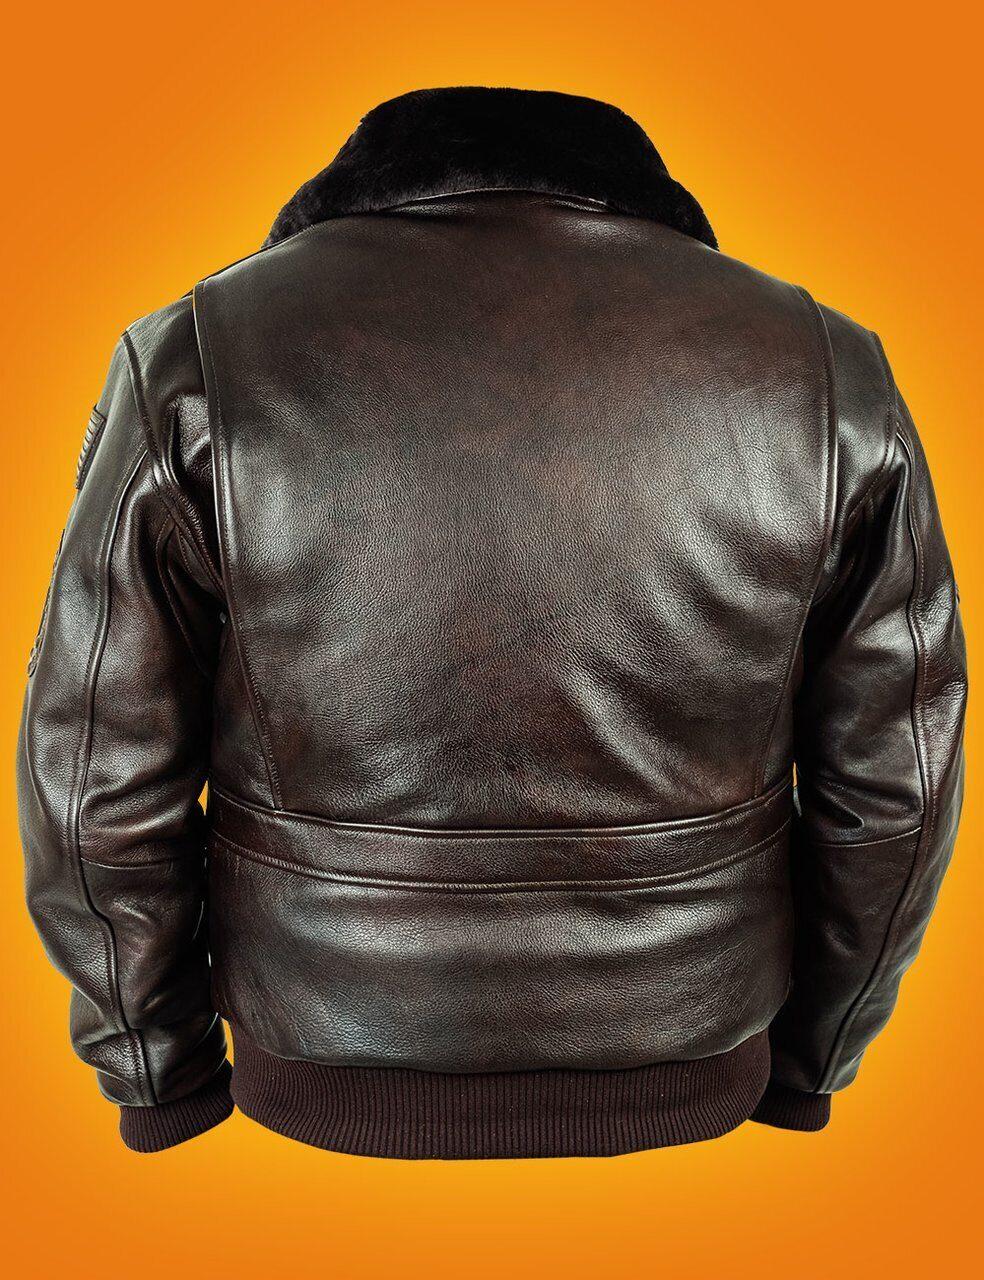 Bison Store Интернет Магазин Кожаных Курток Отзывы